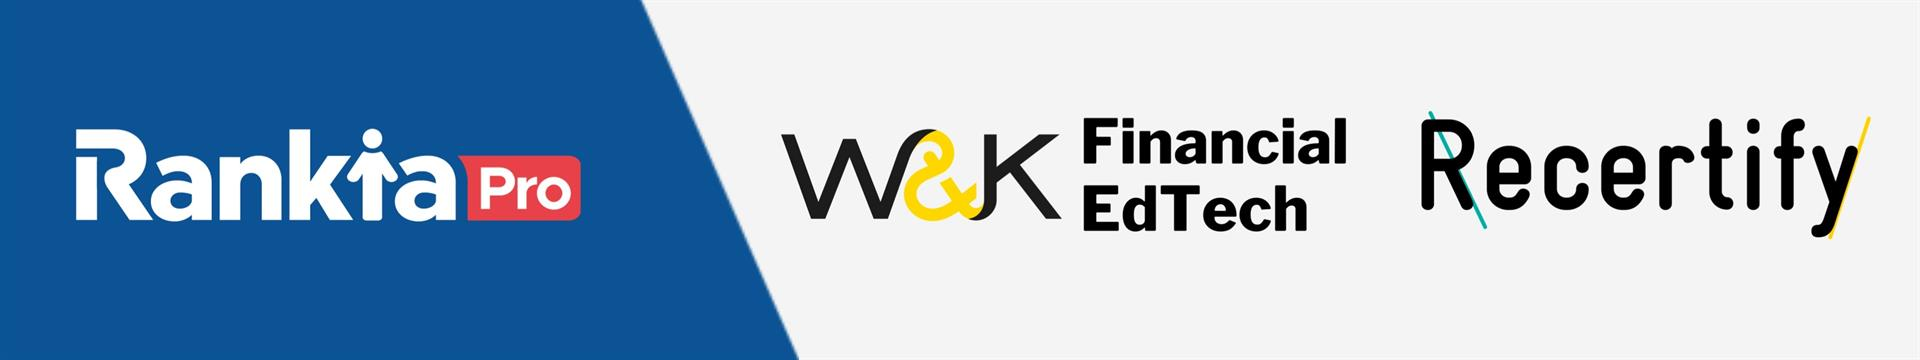 Logos RankiaPro, W&K Financial EdTech y Recertify